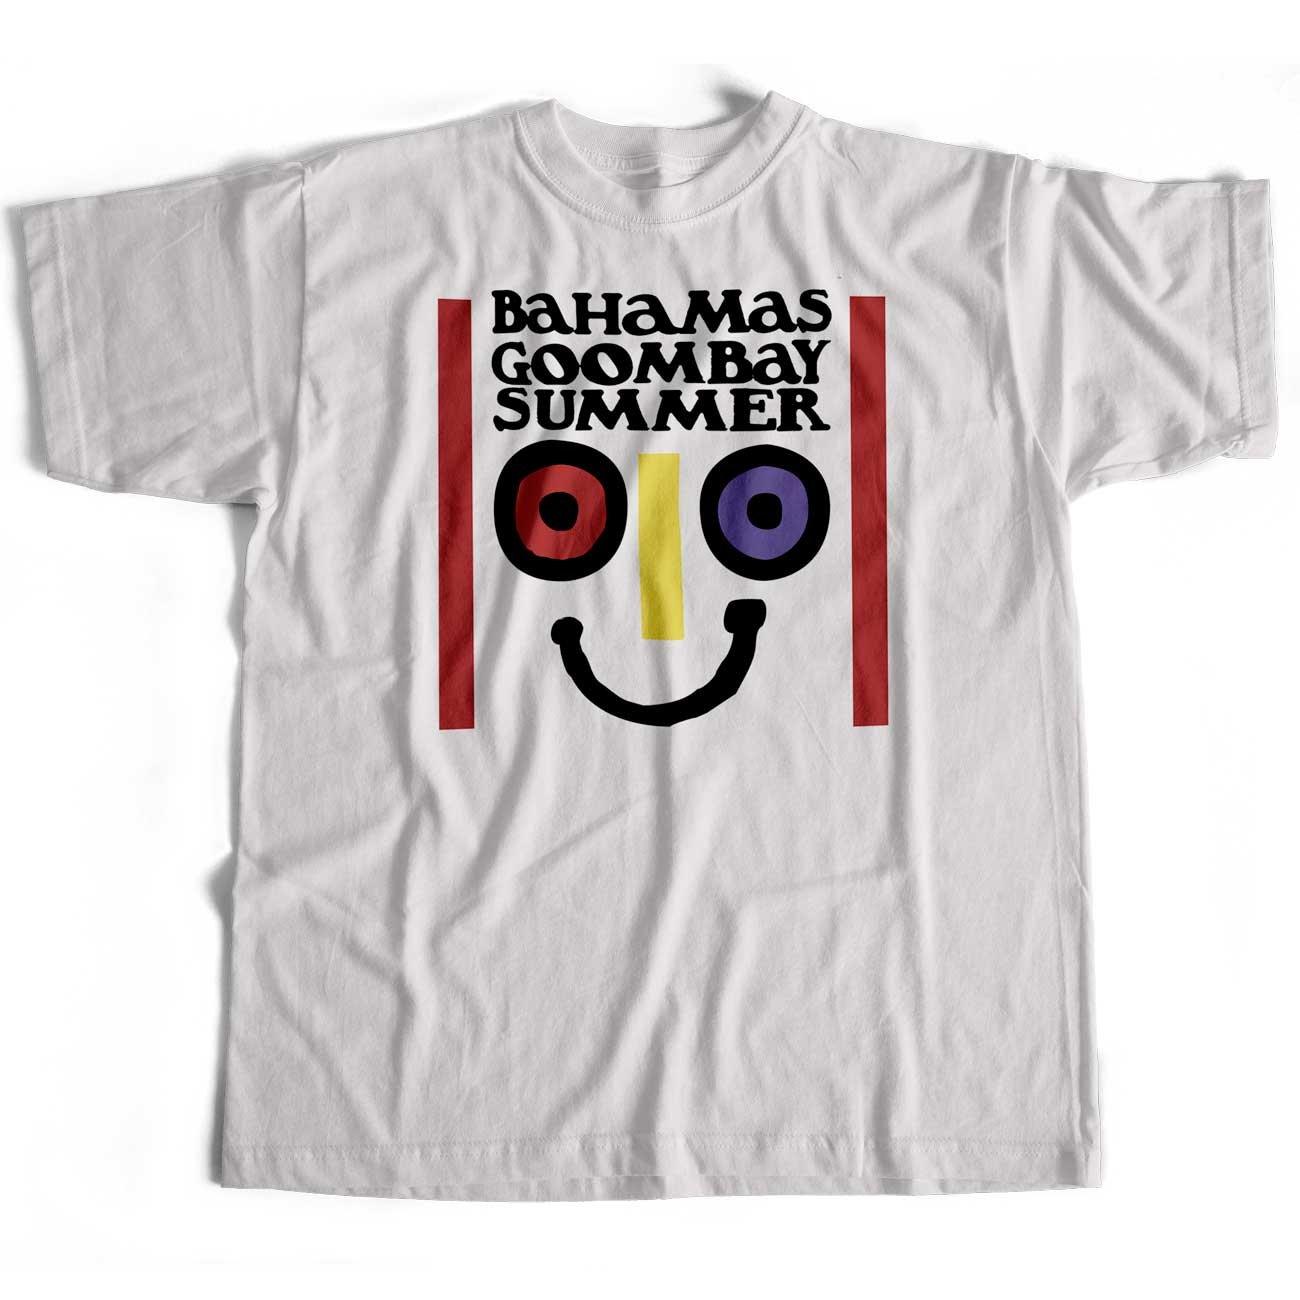 As Worn by Jaco Pastorius T Shirt - Bahamas Goombay Summer - XXL